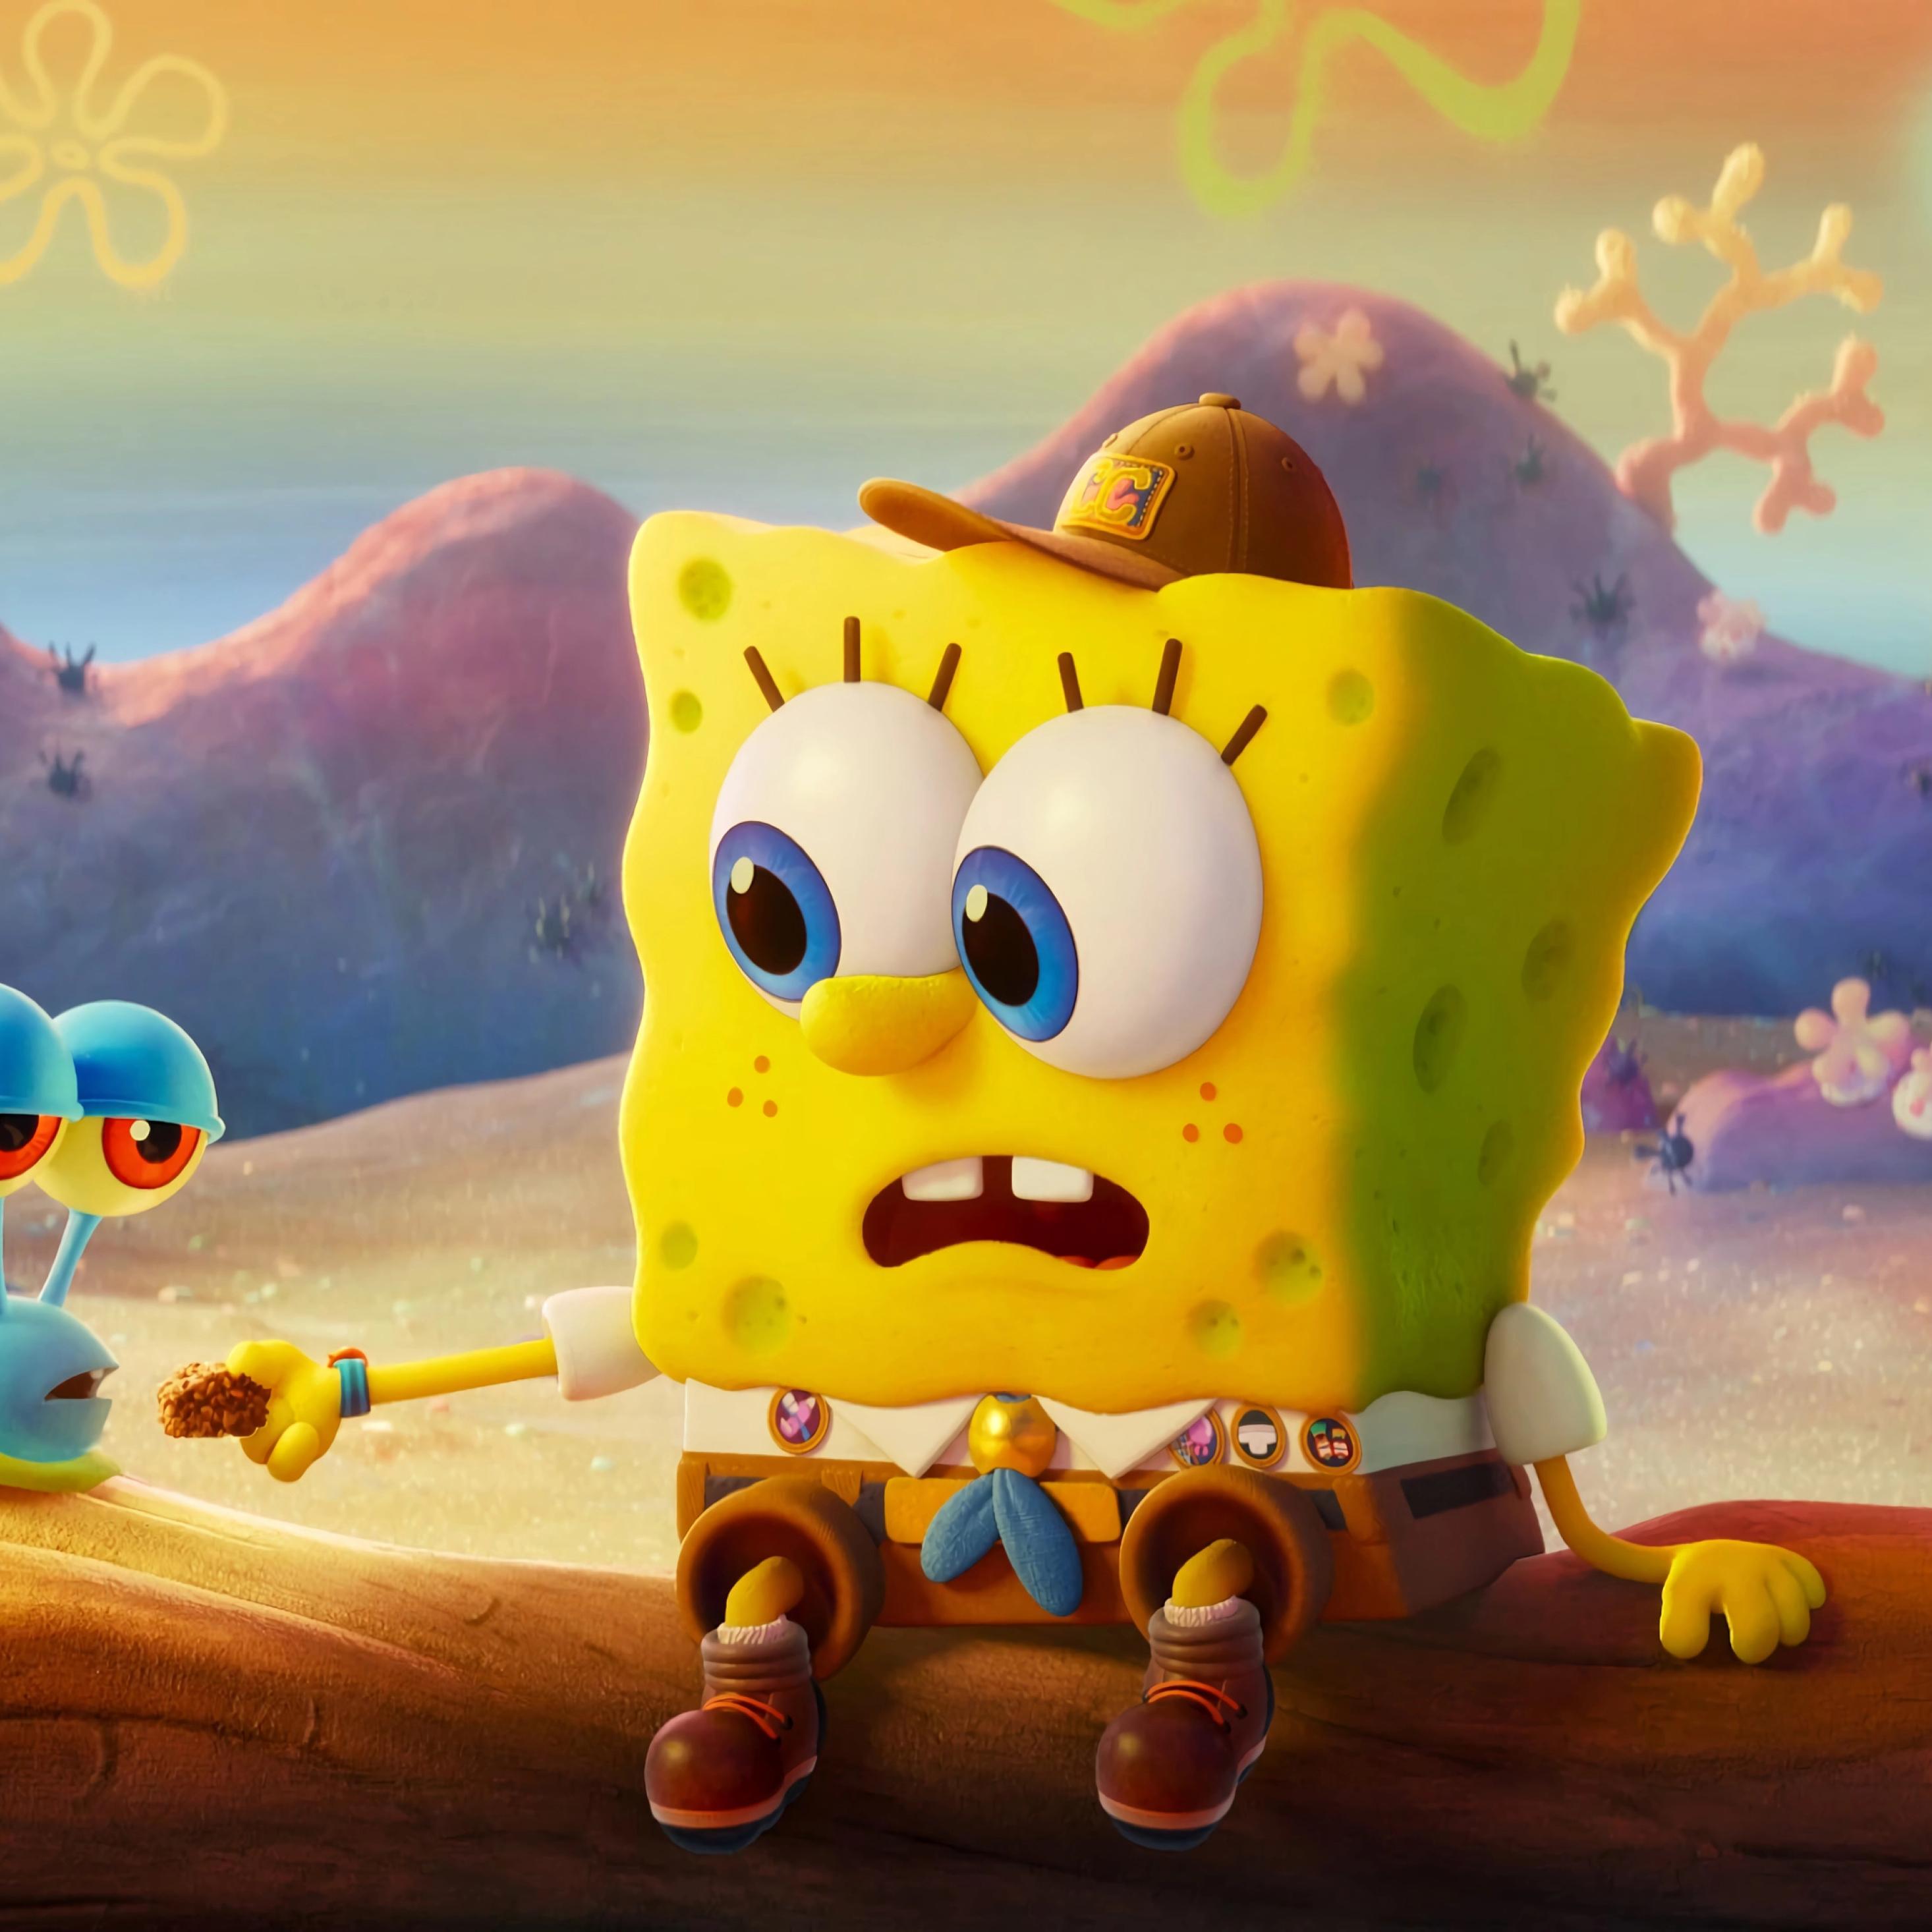 2932x2932 Gary & SpongeBob Ipad Pro Retina Display ...